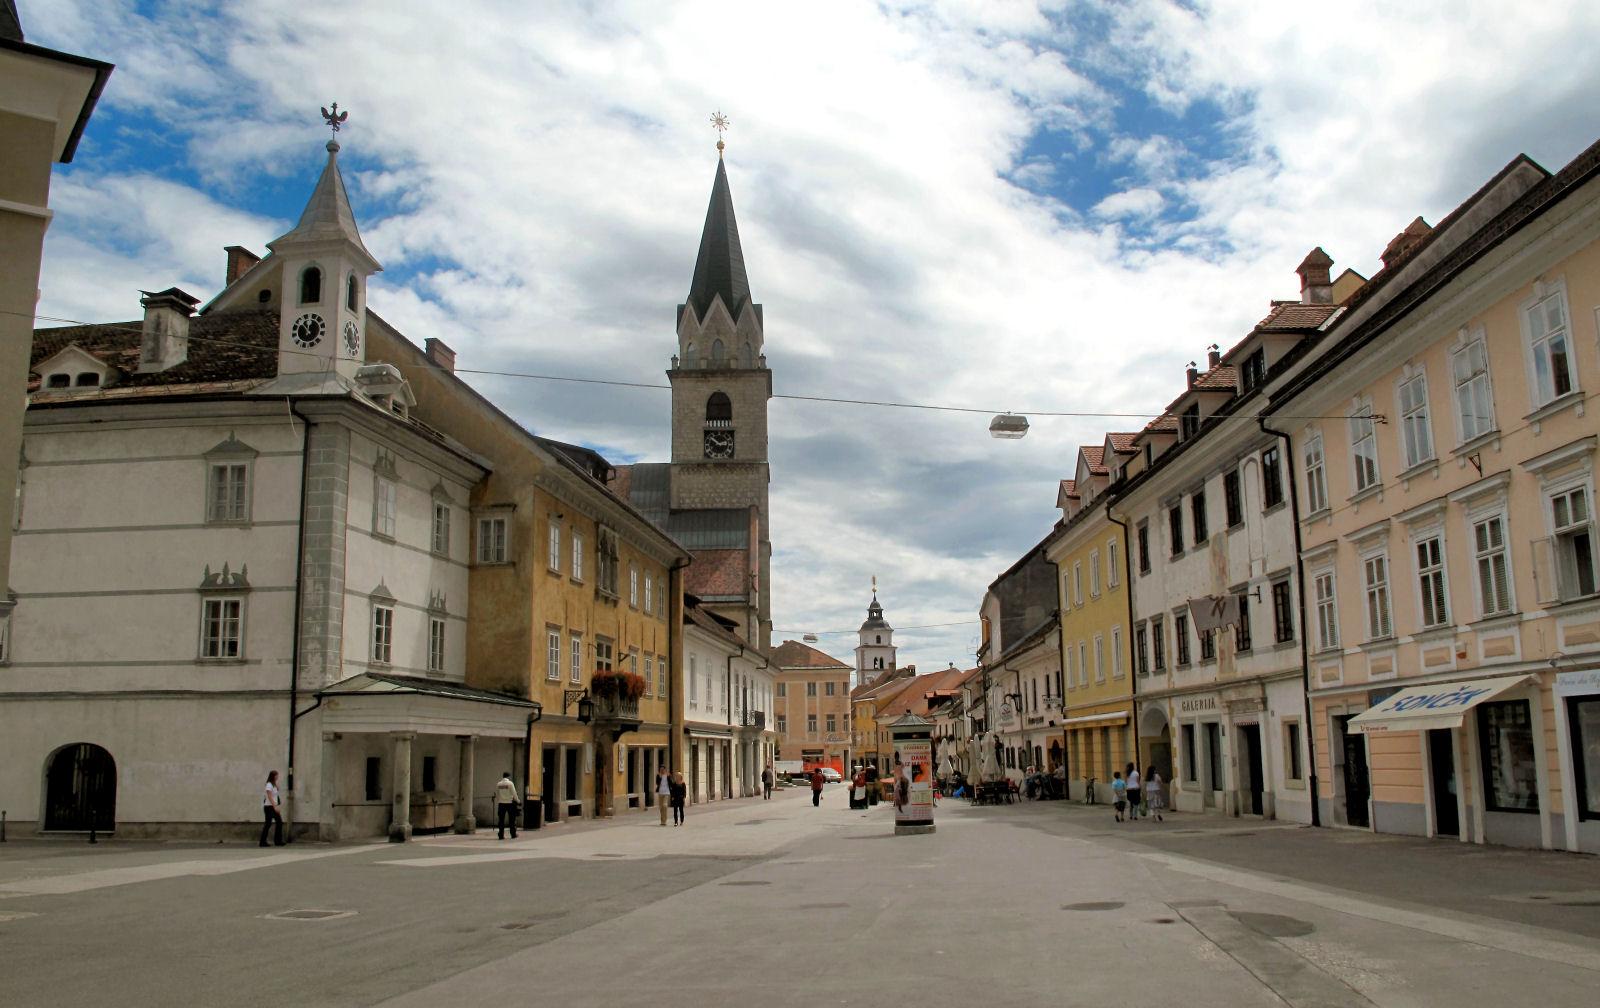 Kranj, the capital of the Gorenjska region, Slovenia